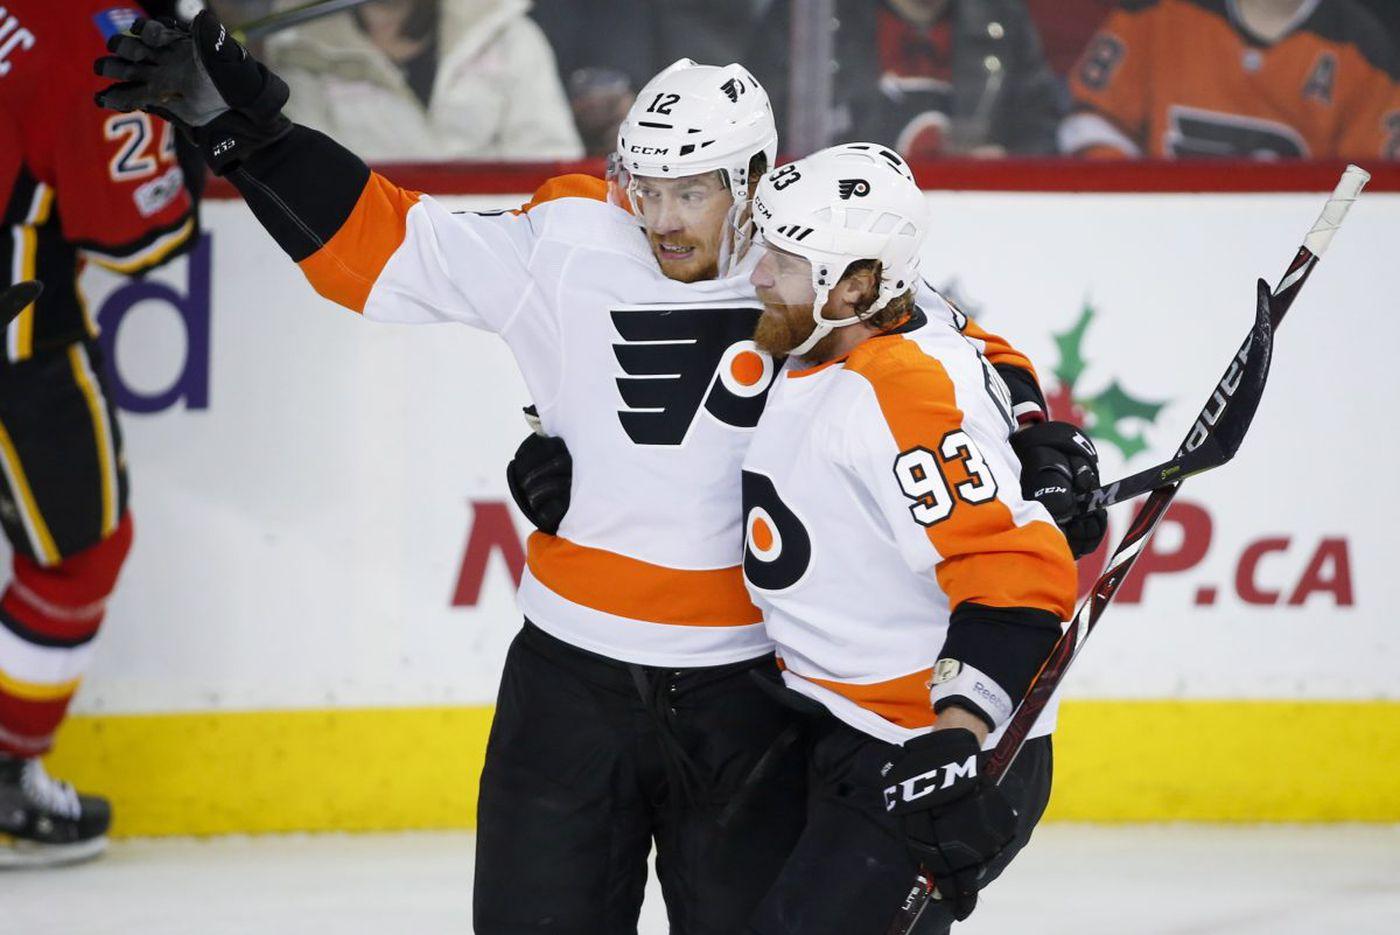 Michael Raffl, Flyers find spirit of season with 3-game winning streak